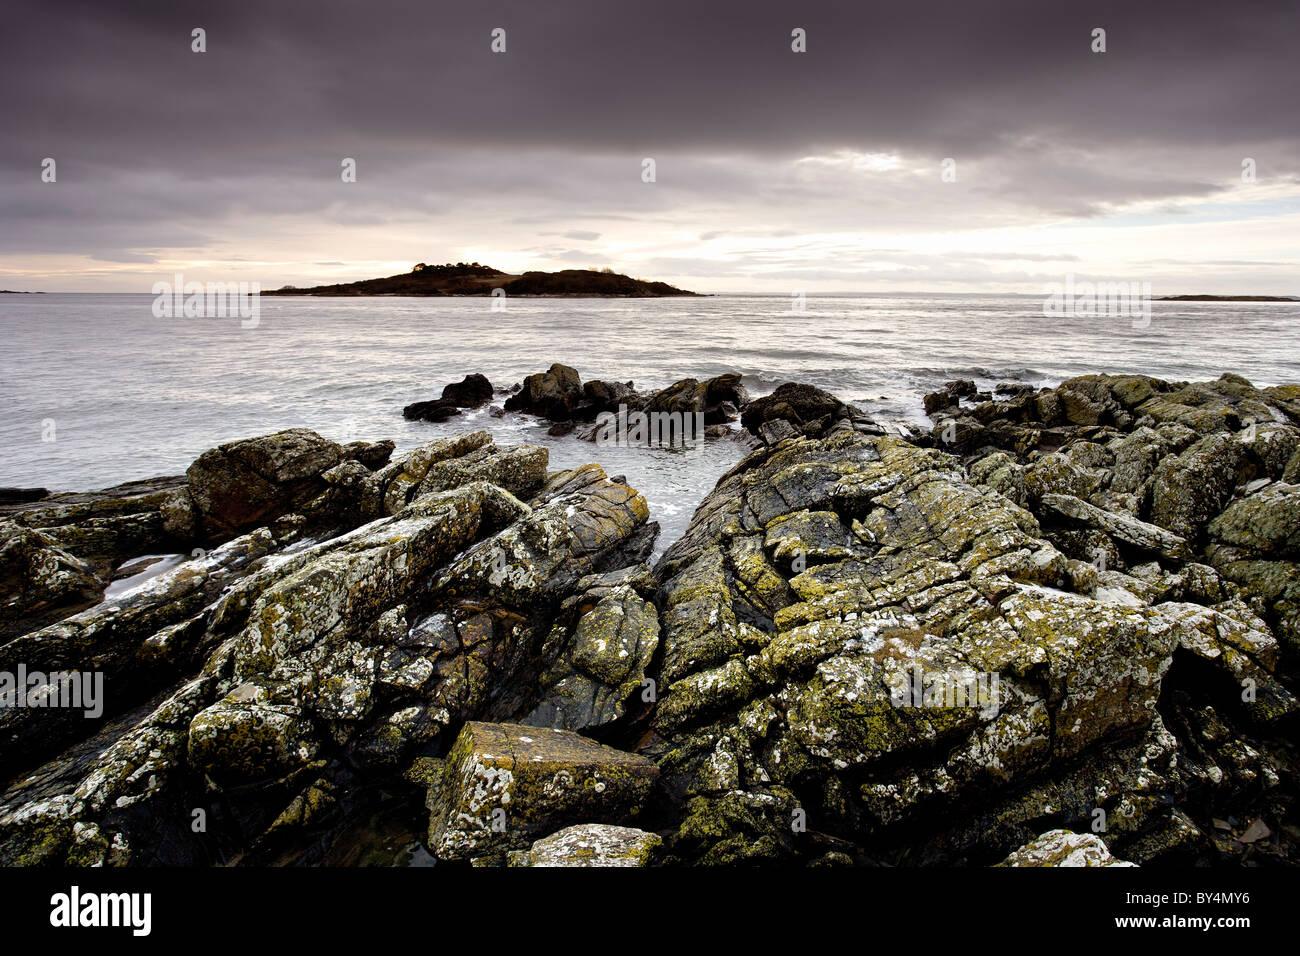 Ardwall Island, Carrick Shore, Dumfries and Galloway, Scotland - Stock Image